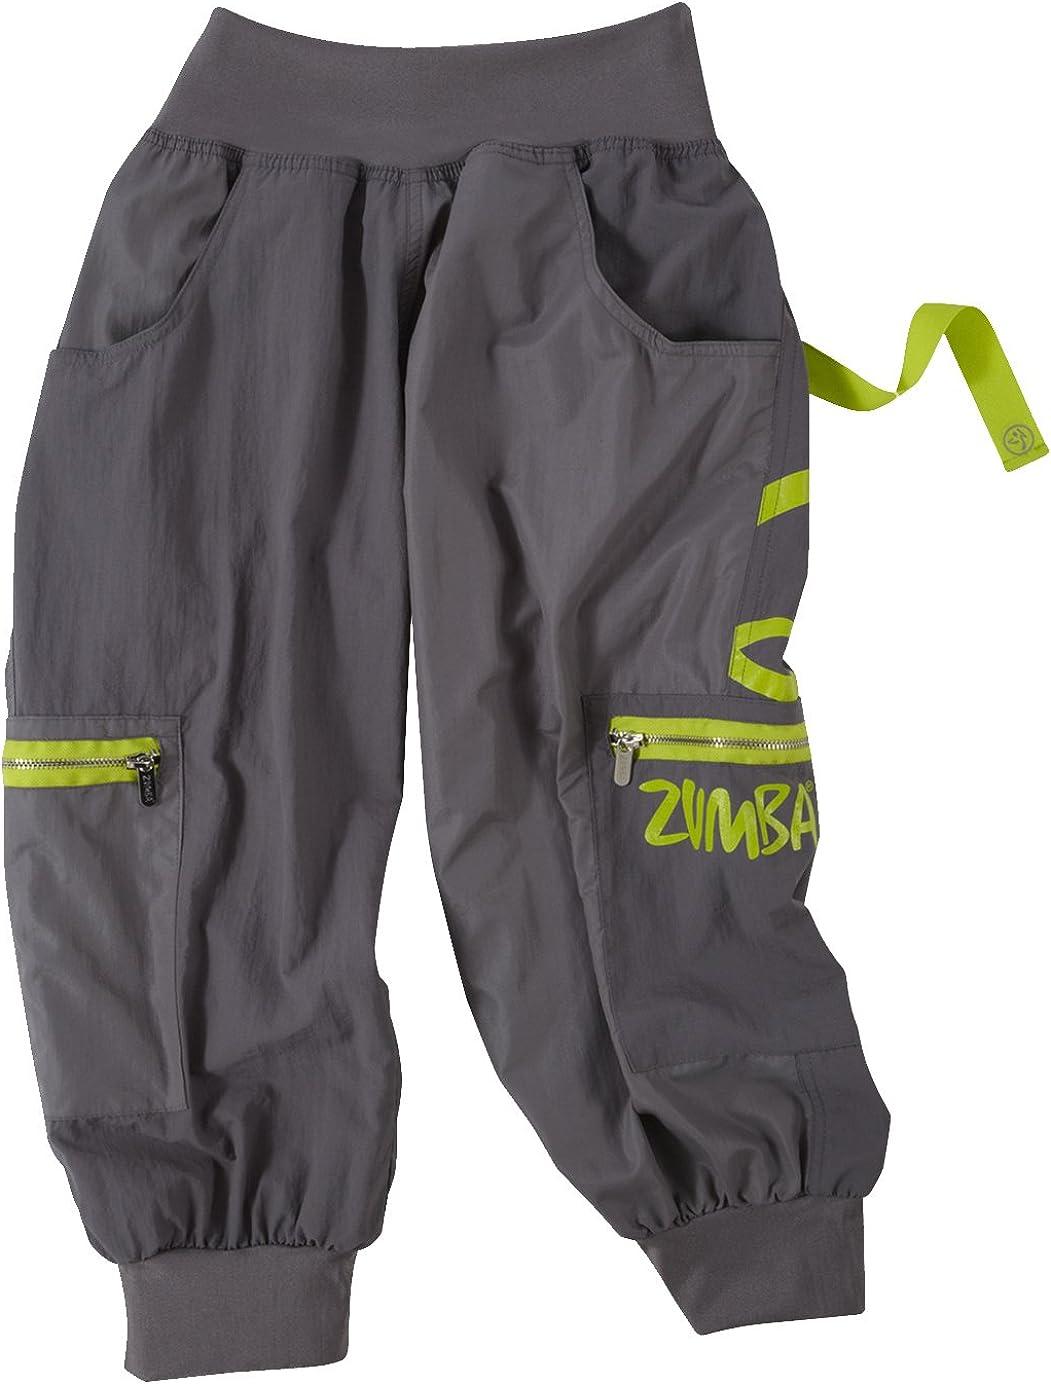 Zumba Women's Wonder OFFicial mail 55% OFF order Cargo Capri Pants